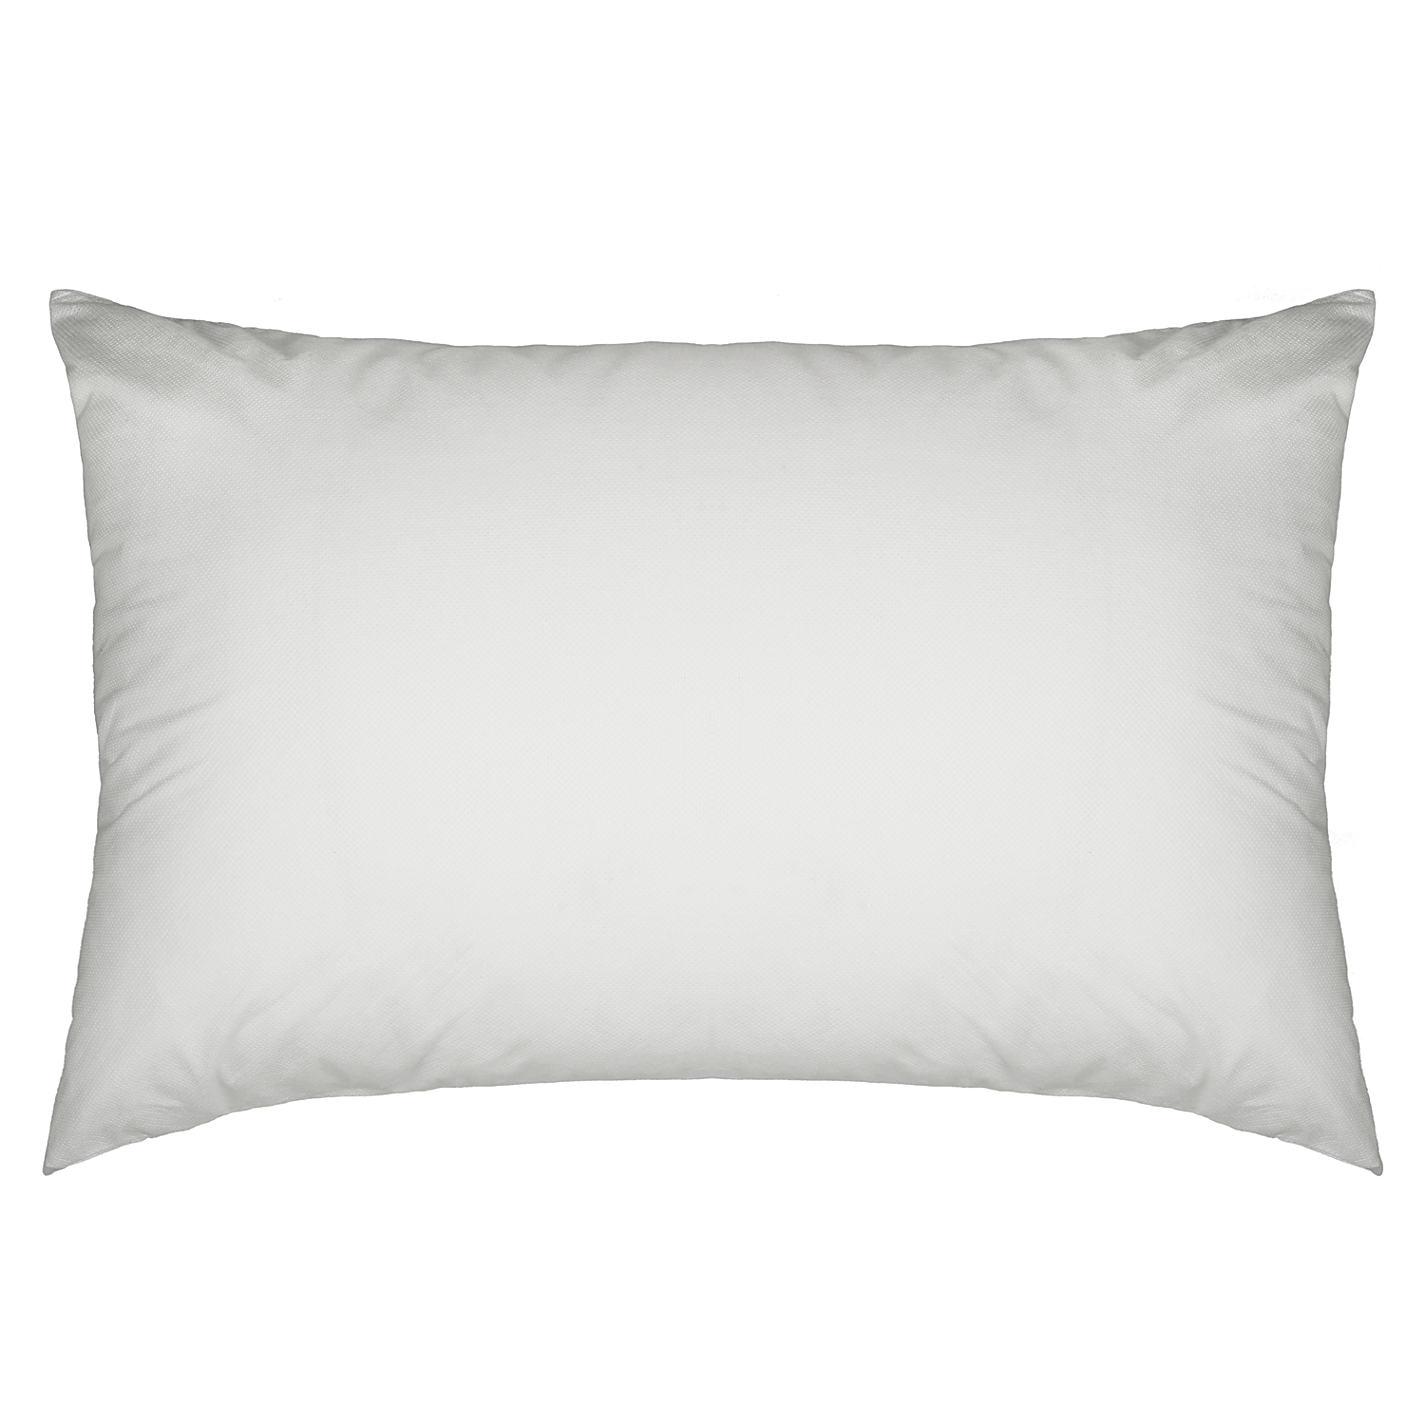 buy john lewis anti allergy specialist pillow protectors pair